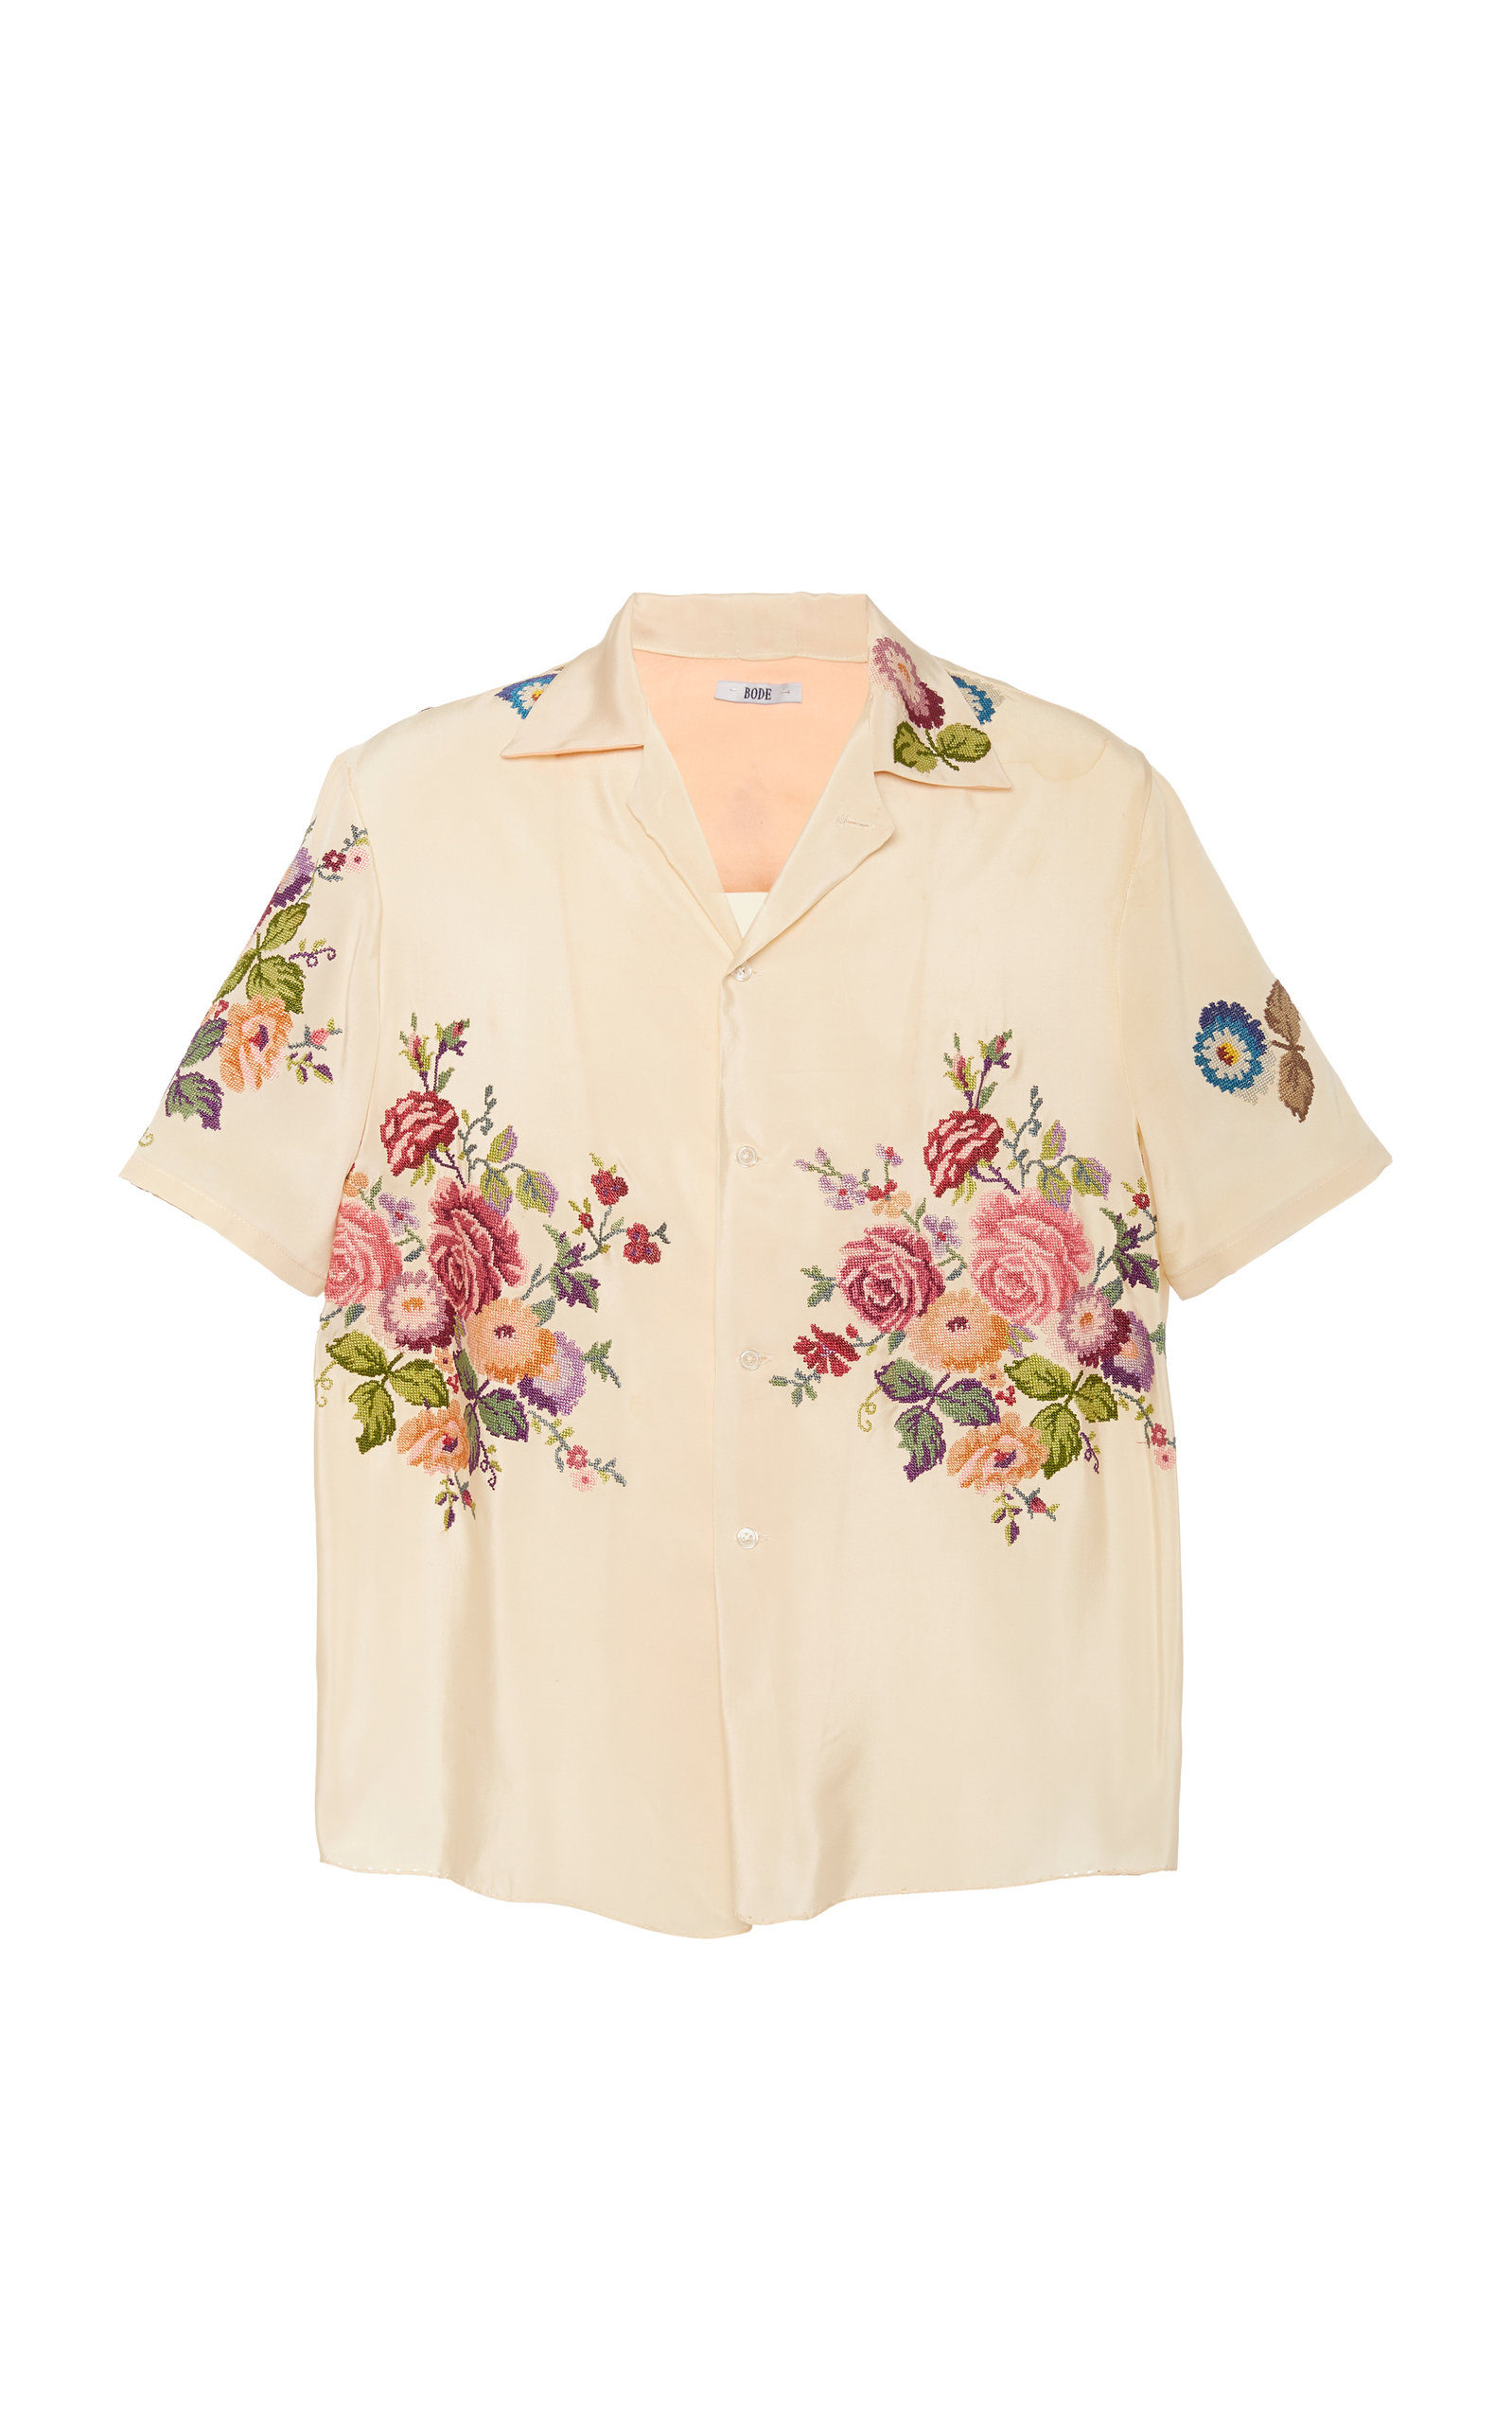 71cbfe22c3 Camp-Collar Floral-Embroidered Silk Shirt